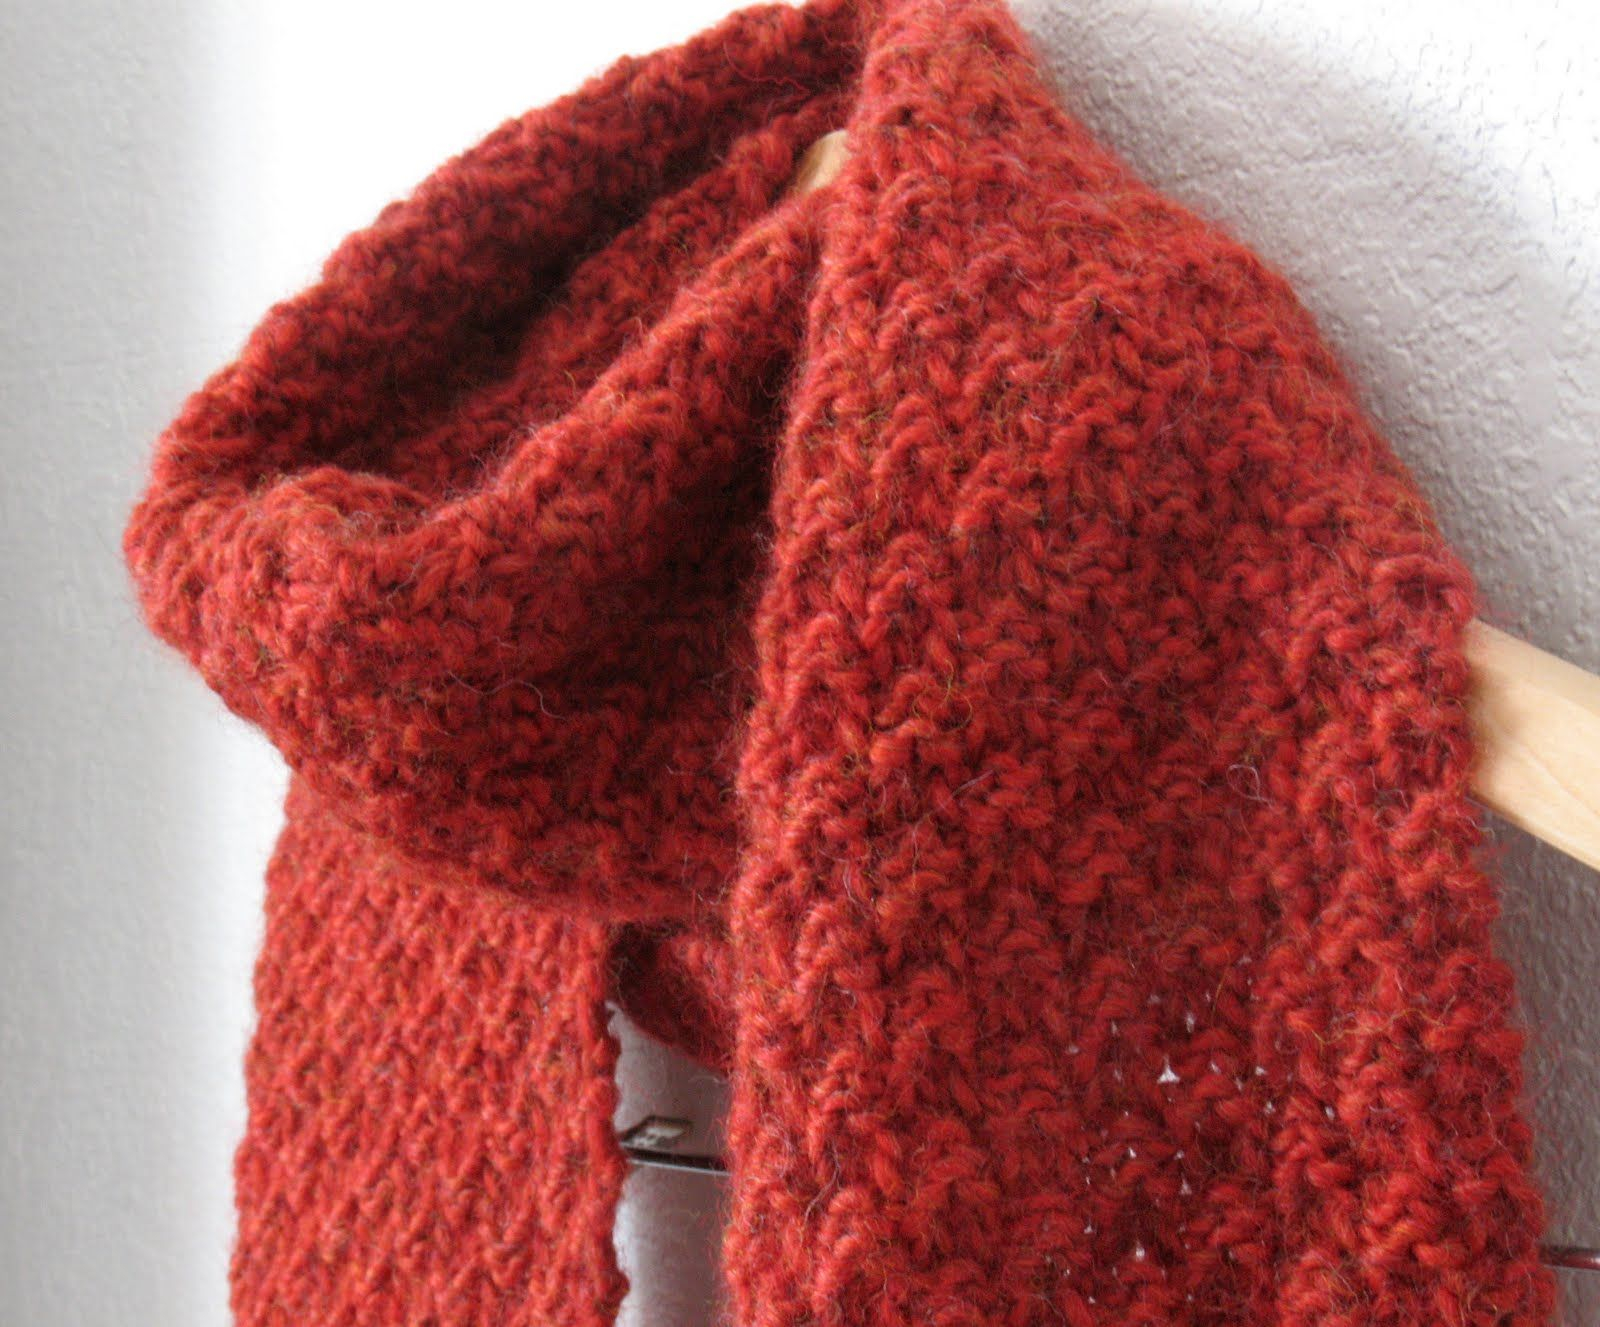 Double Knitting Tutorial Scarfs Hachi Free Knitting Patterns Double Seed Stitch Scarf Knitting